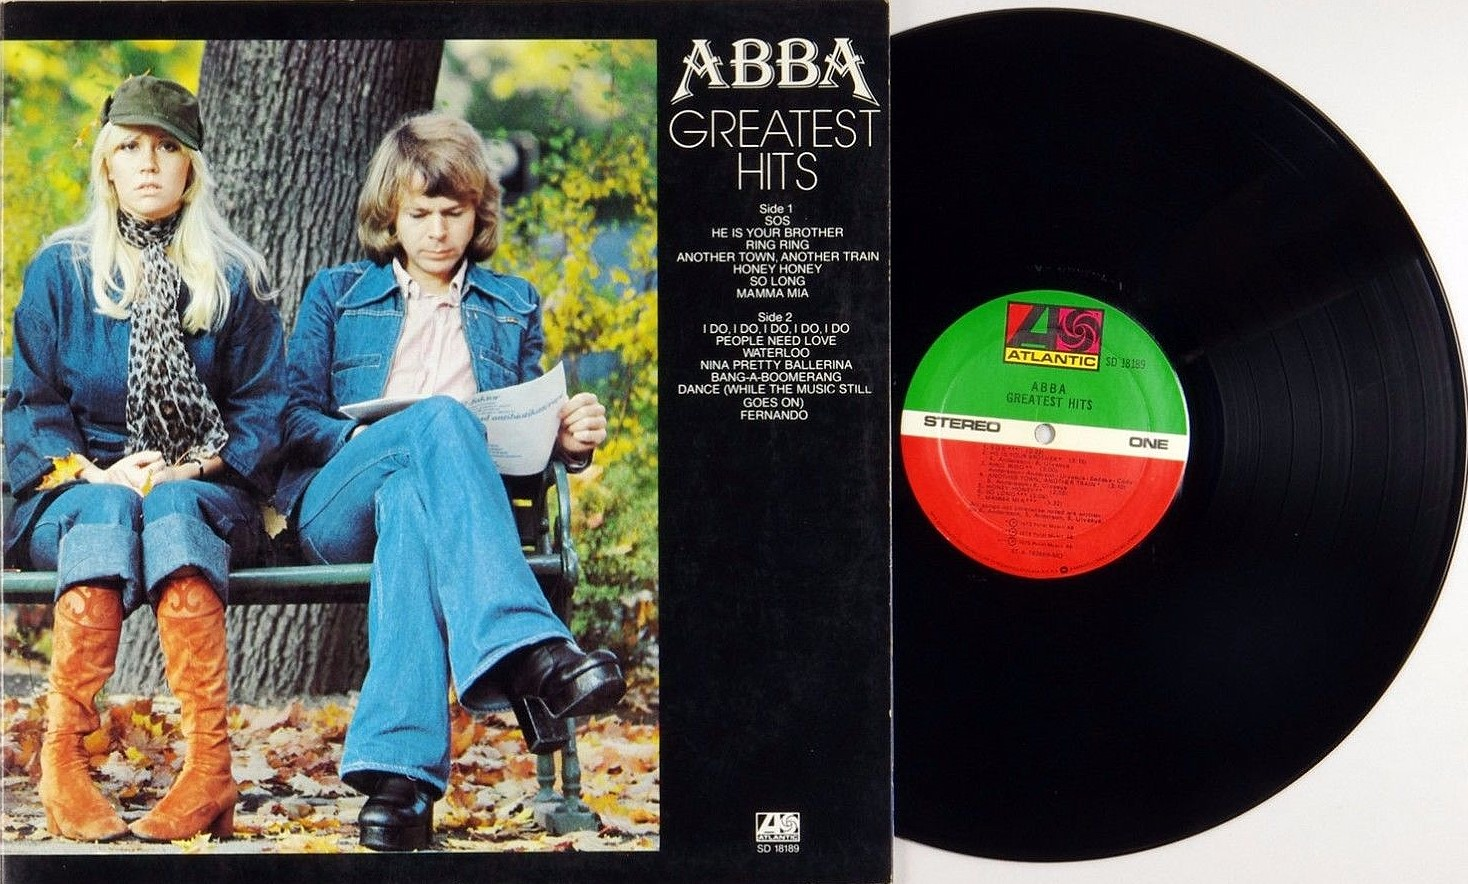 ABBA - Página 5 011174